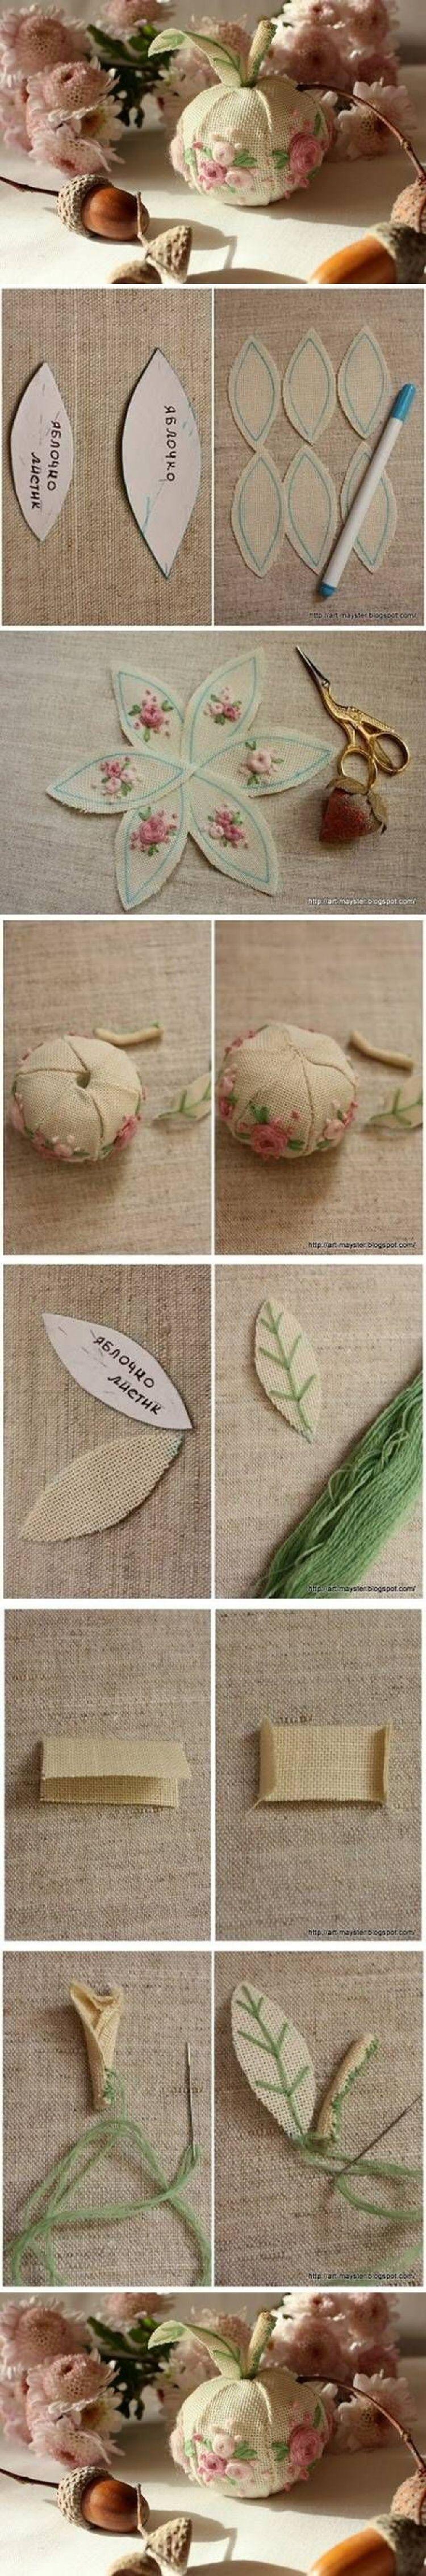 "I ❤ pincushions . . . DIY Fabric Apple Decor- ""the shape looks kind of like one to me"""